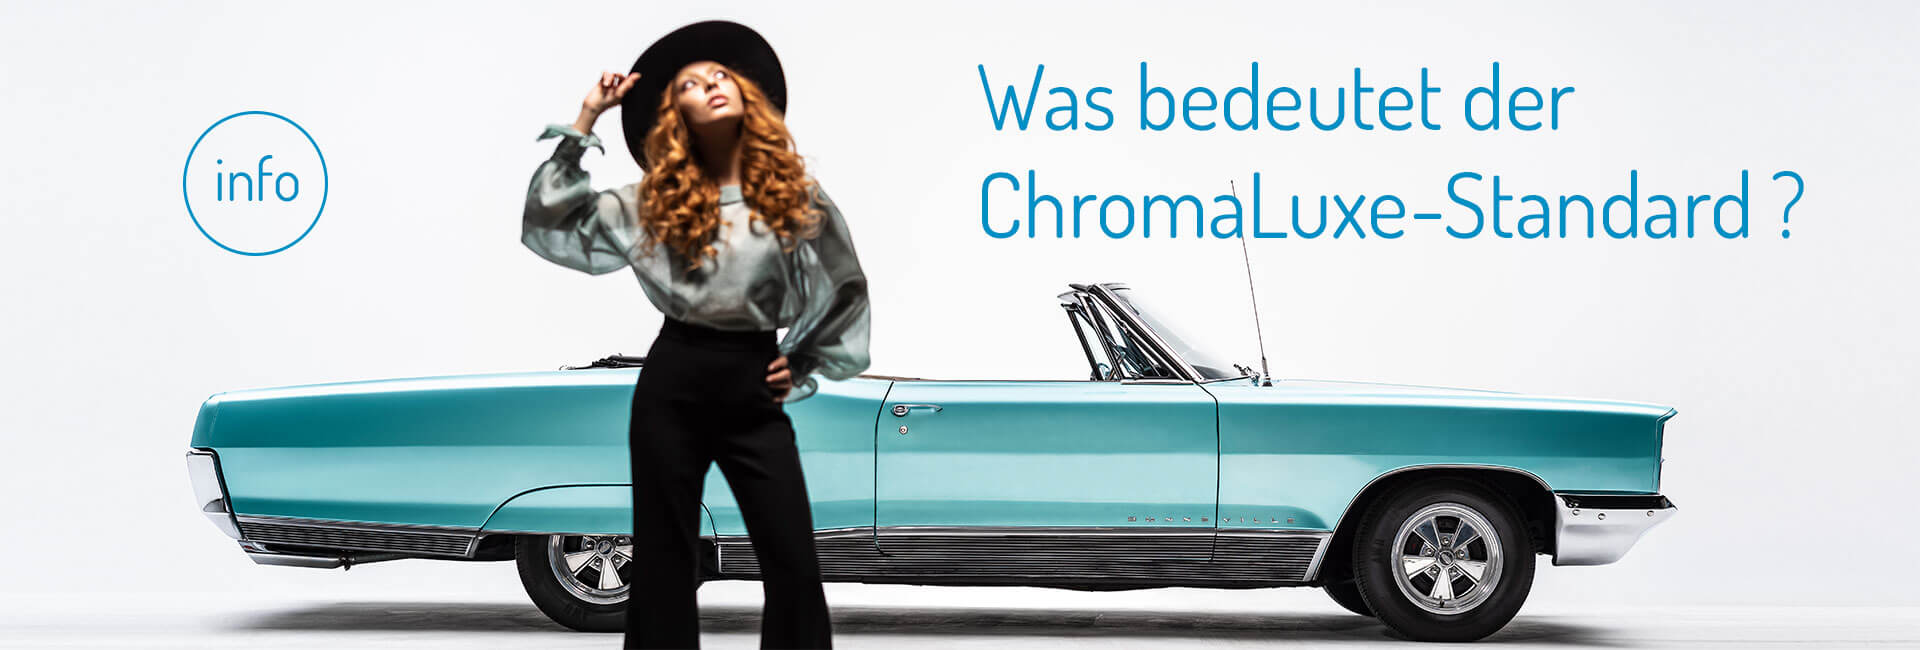 Was bedeutet der ChromaLuxe-Standard?